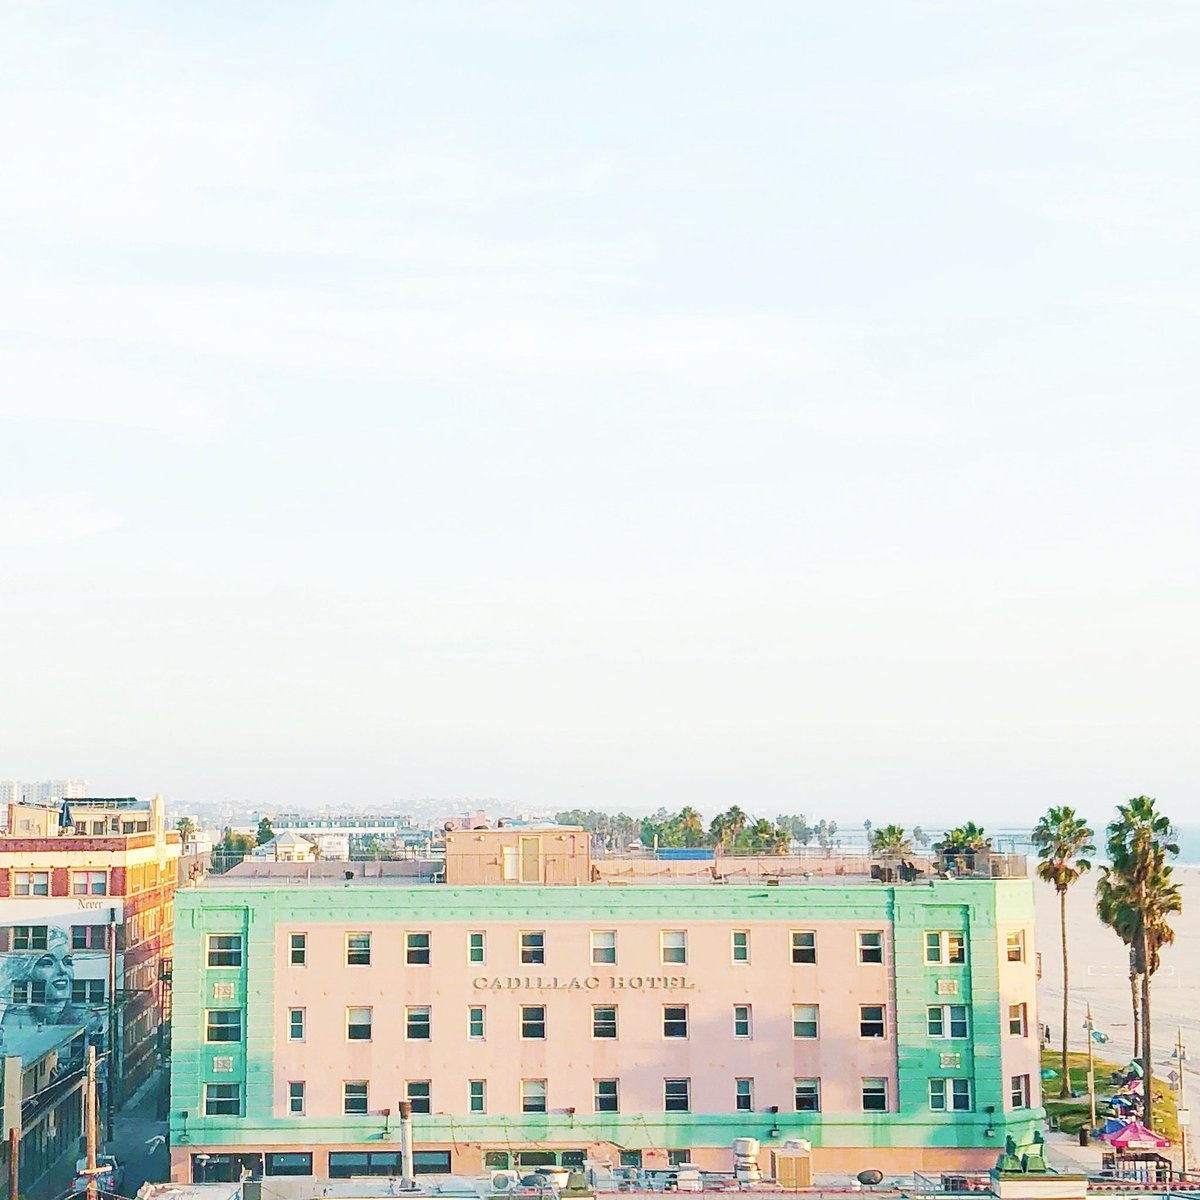 🌴 Venice Beach, CA | Oct 2018